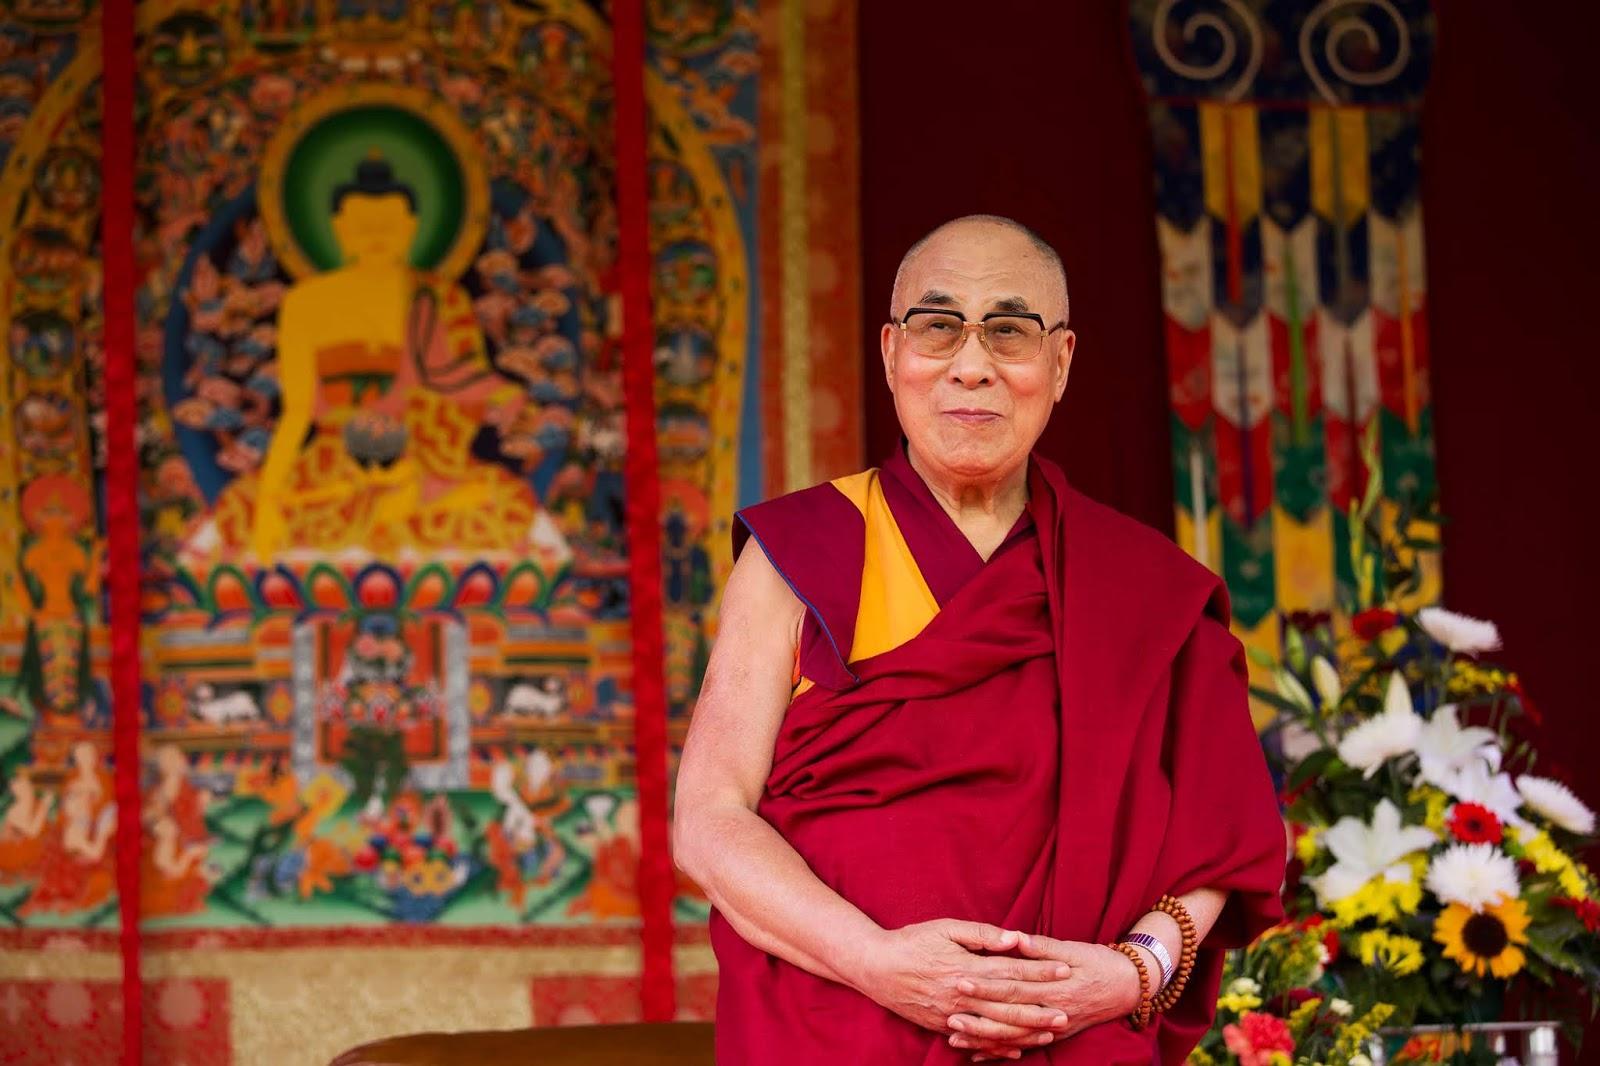 Dalai Lama HD wallpapers and backgrounds photos